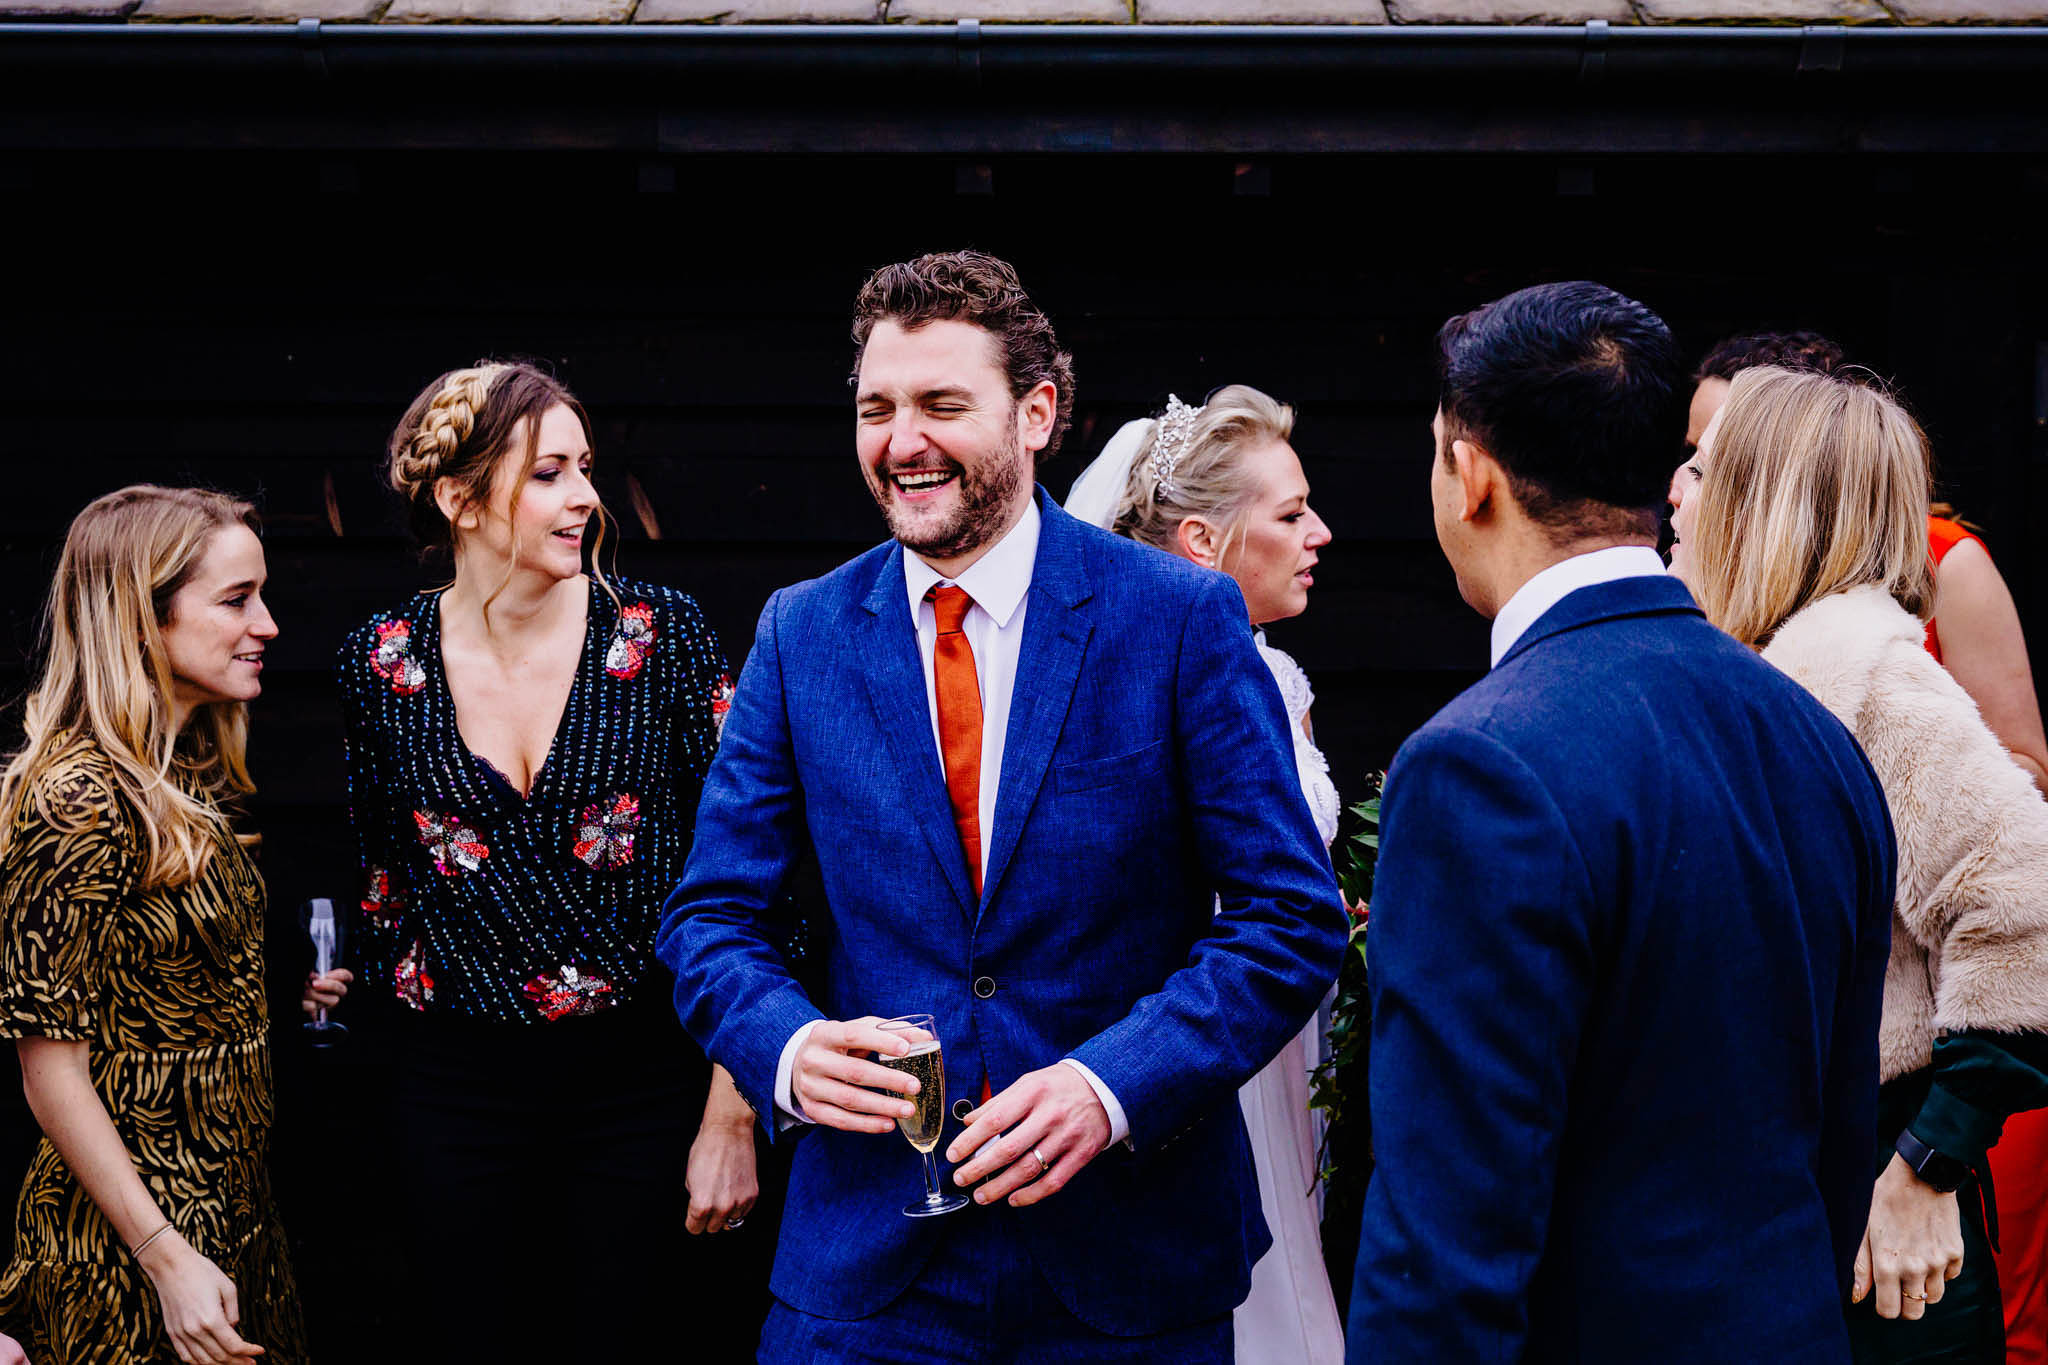 happy, smiling wedding guests